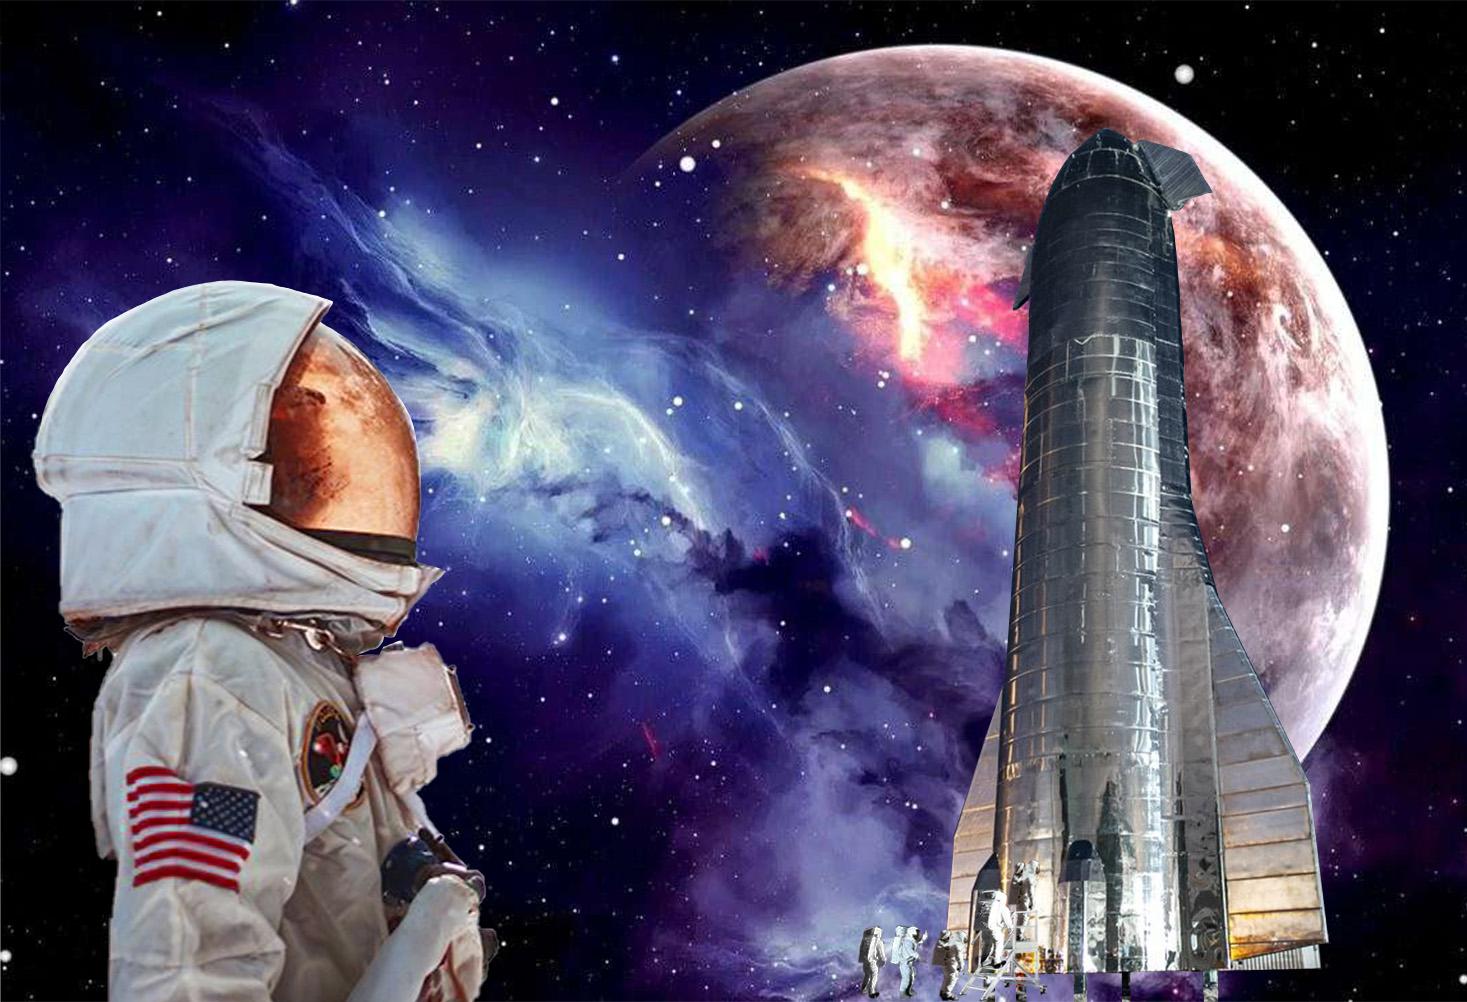 segreti spaziali image